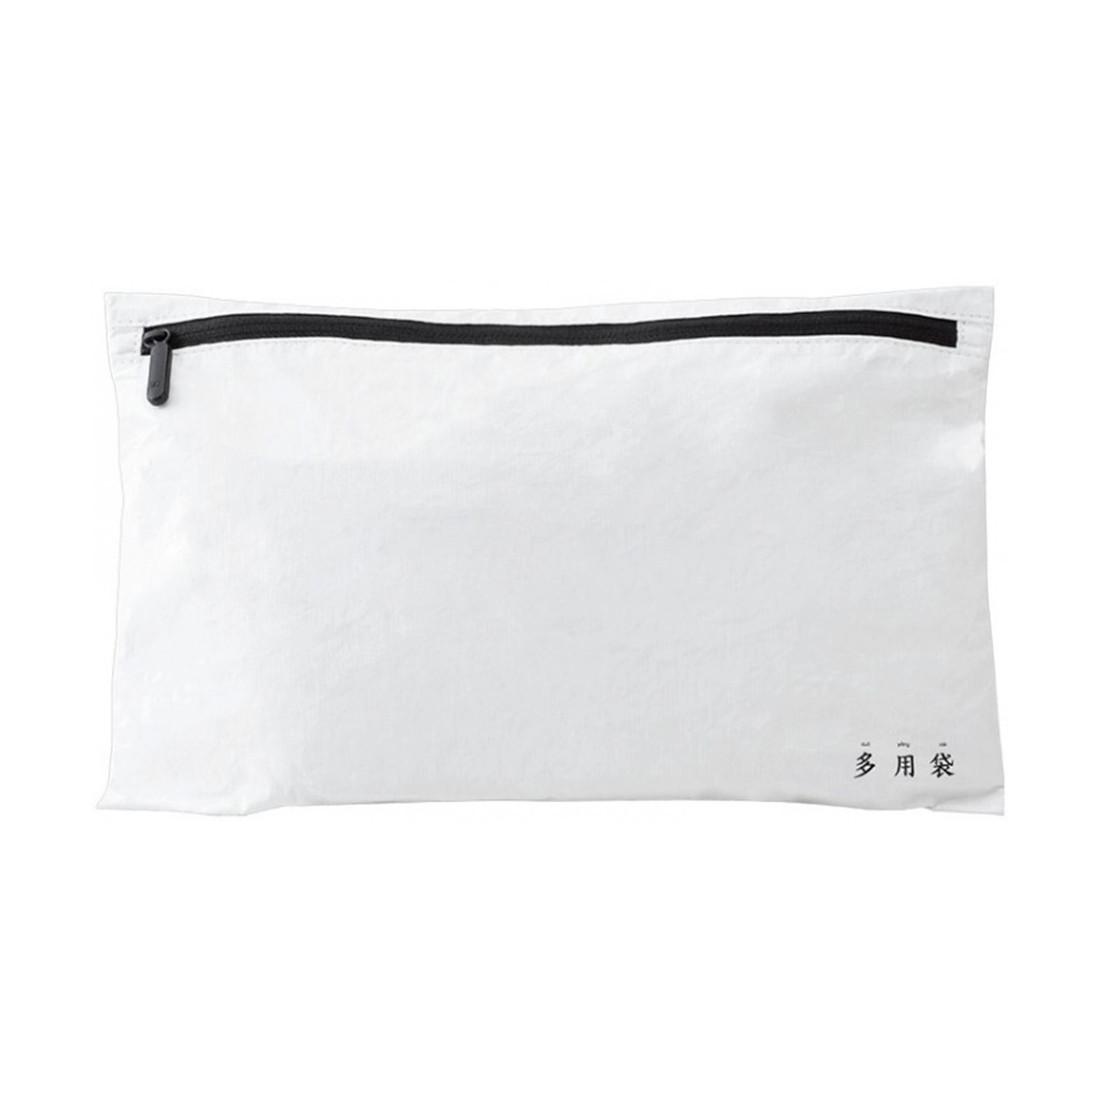 Сумка органайзер Xiaomi 90 Points Tyvek Multi-Purpose Bag (6970055349574, White)